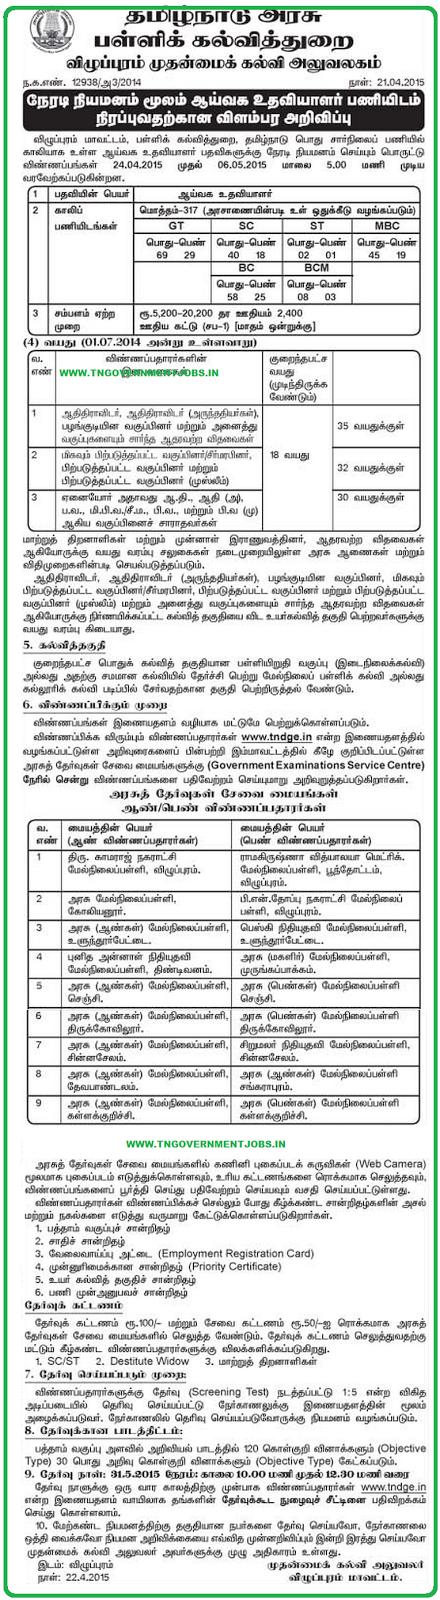 Villupuram CEO Lab Asst Recruitments 2015 (www.tngovernmentjobs.in)